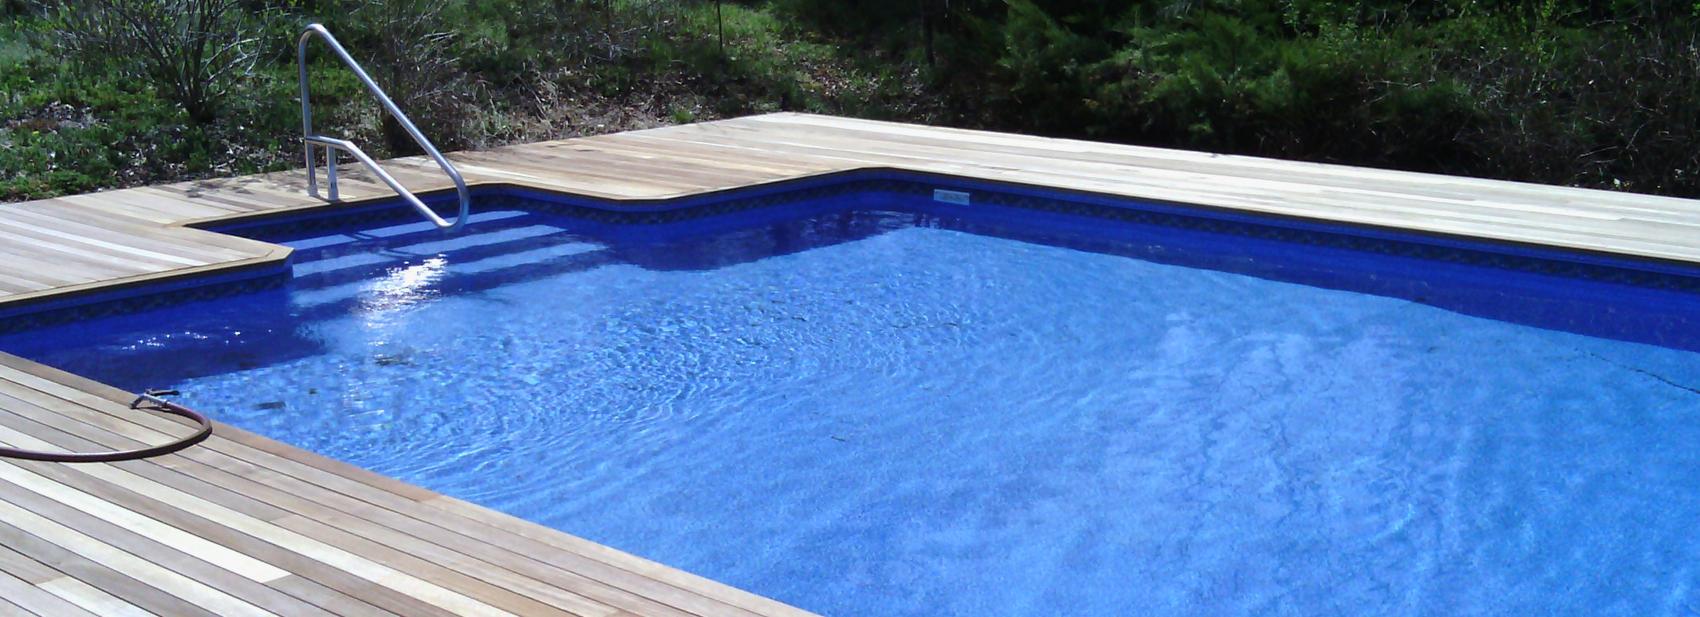 Welcome To Kazdin Pools Kazdin Pools Amp Spas